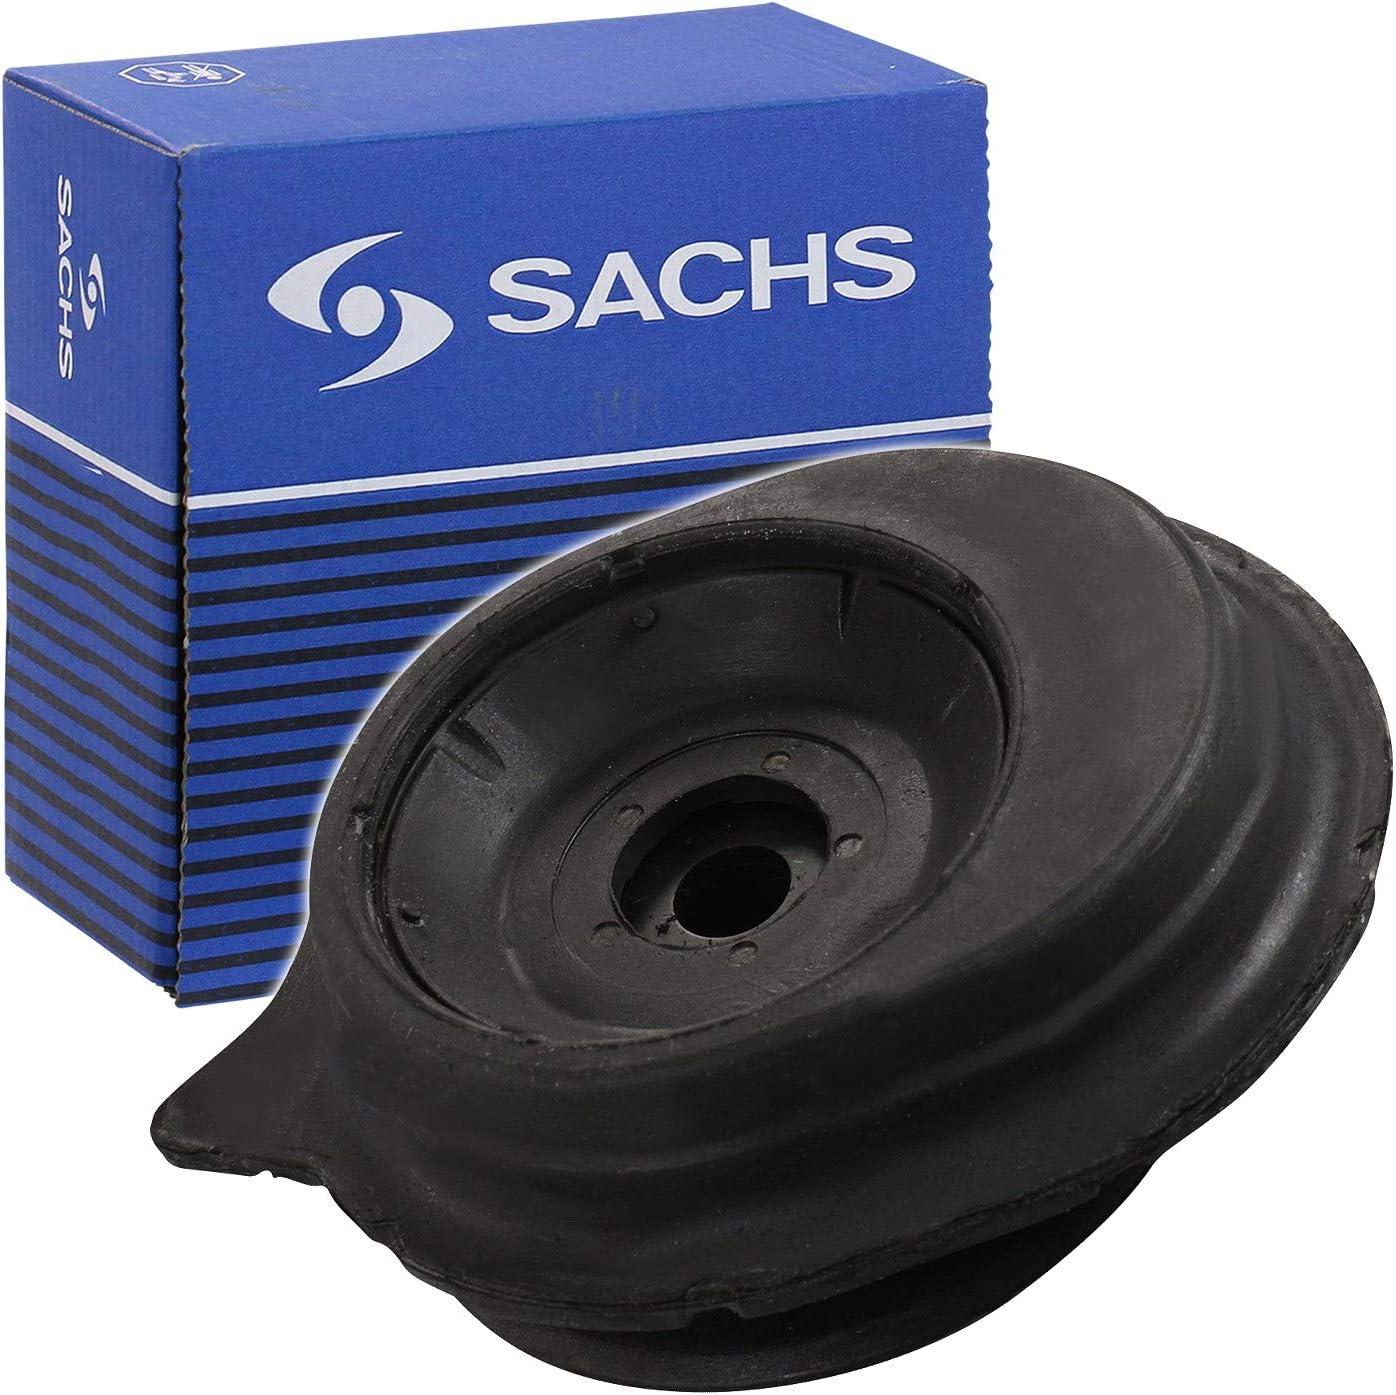 Sachs 802 467 Federbeinst/ützlager